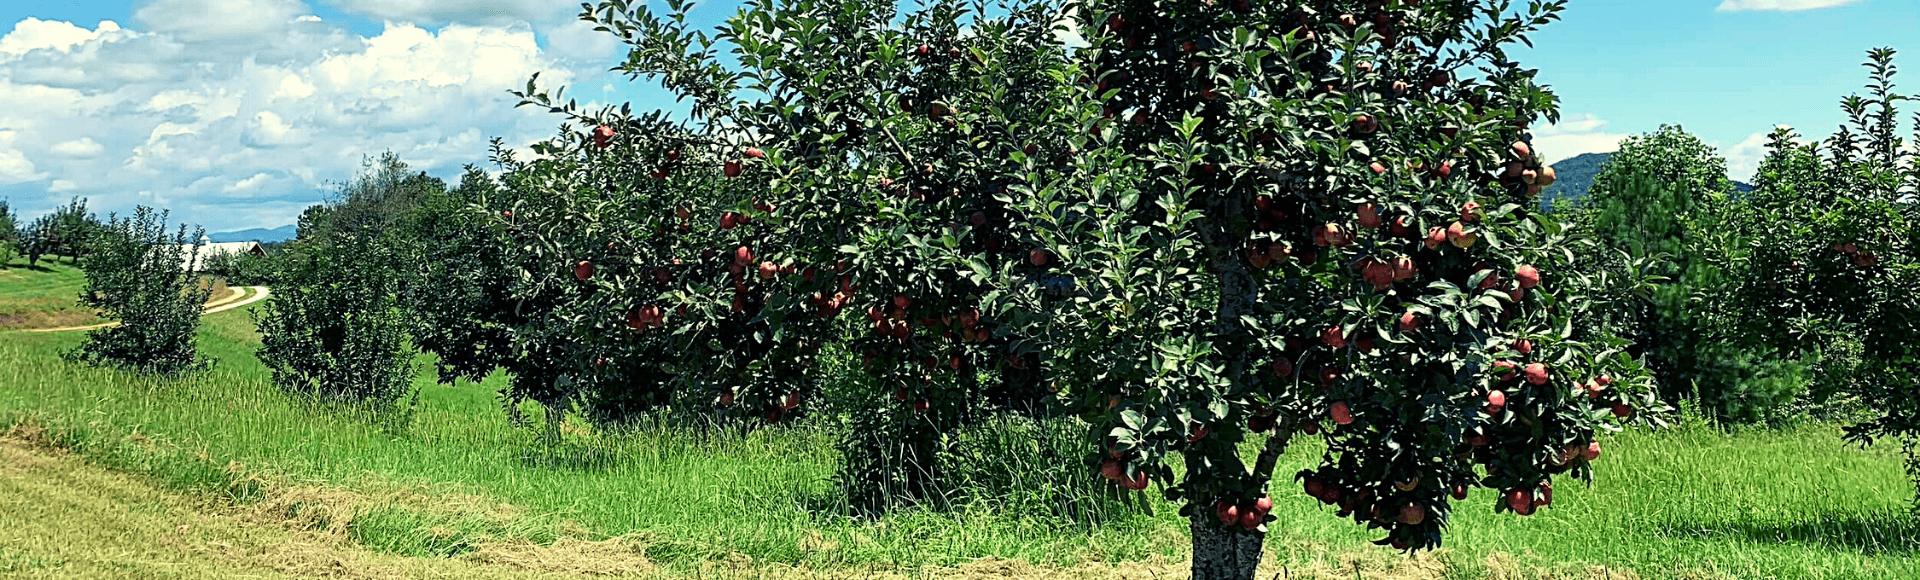 Photo of apple trees